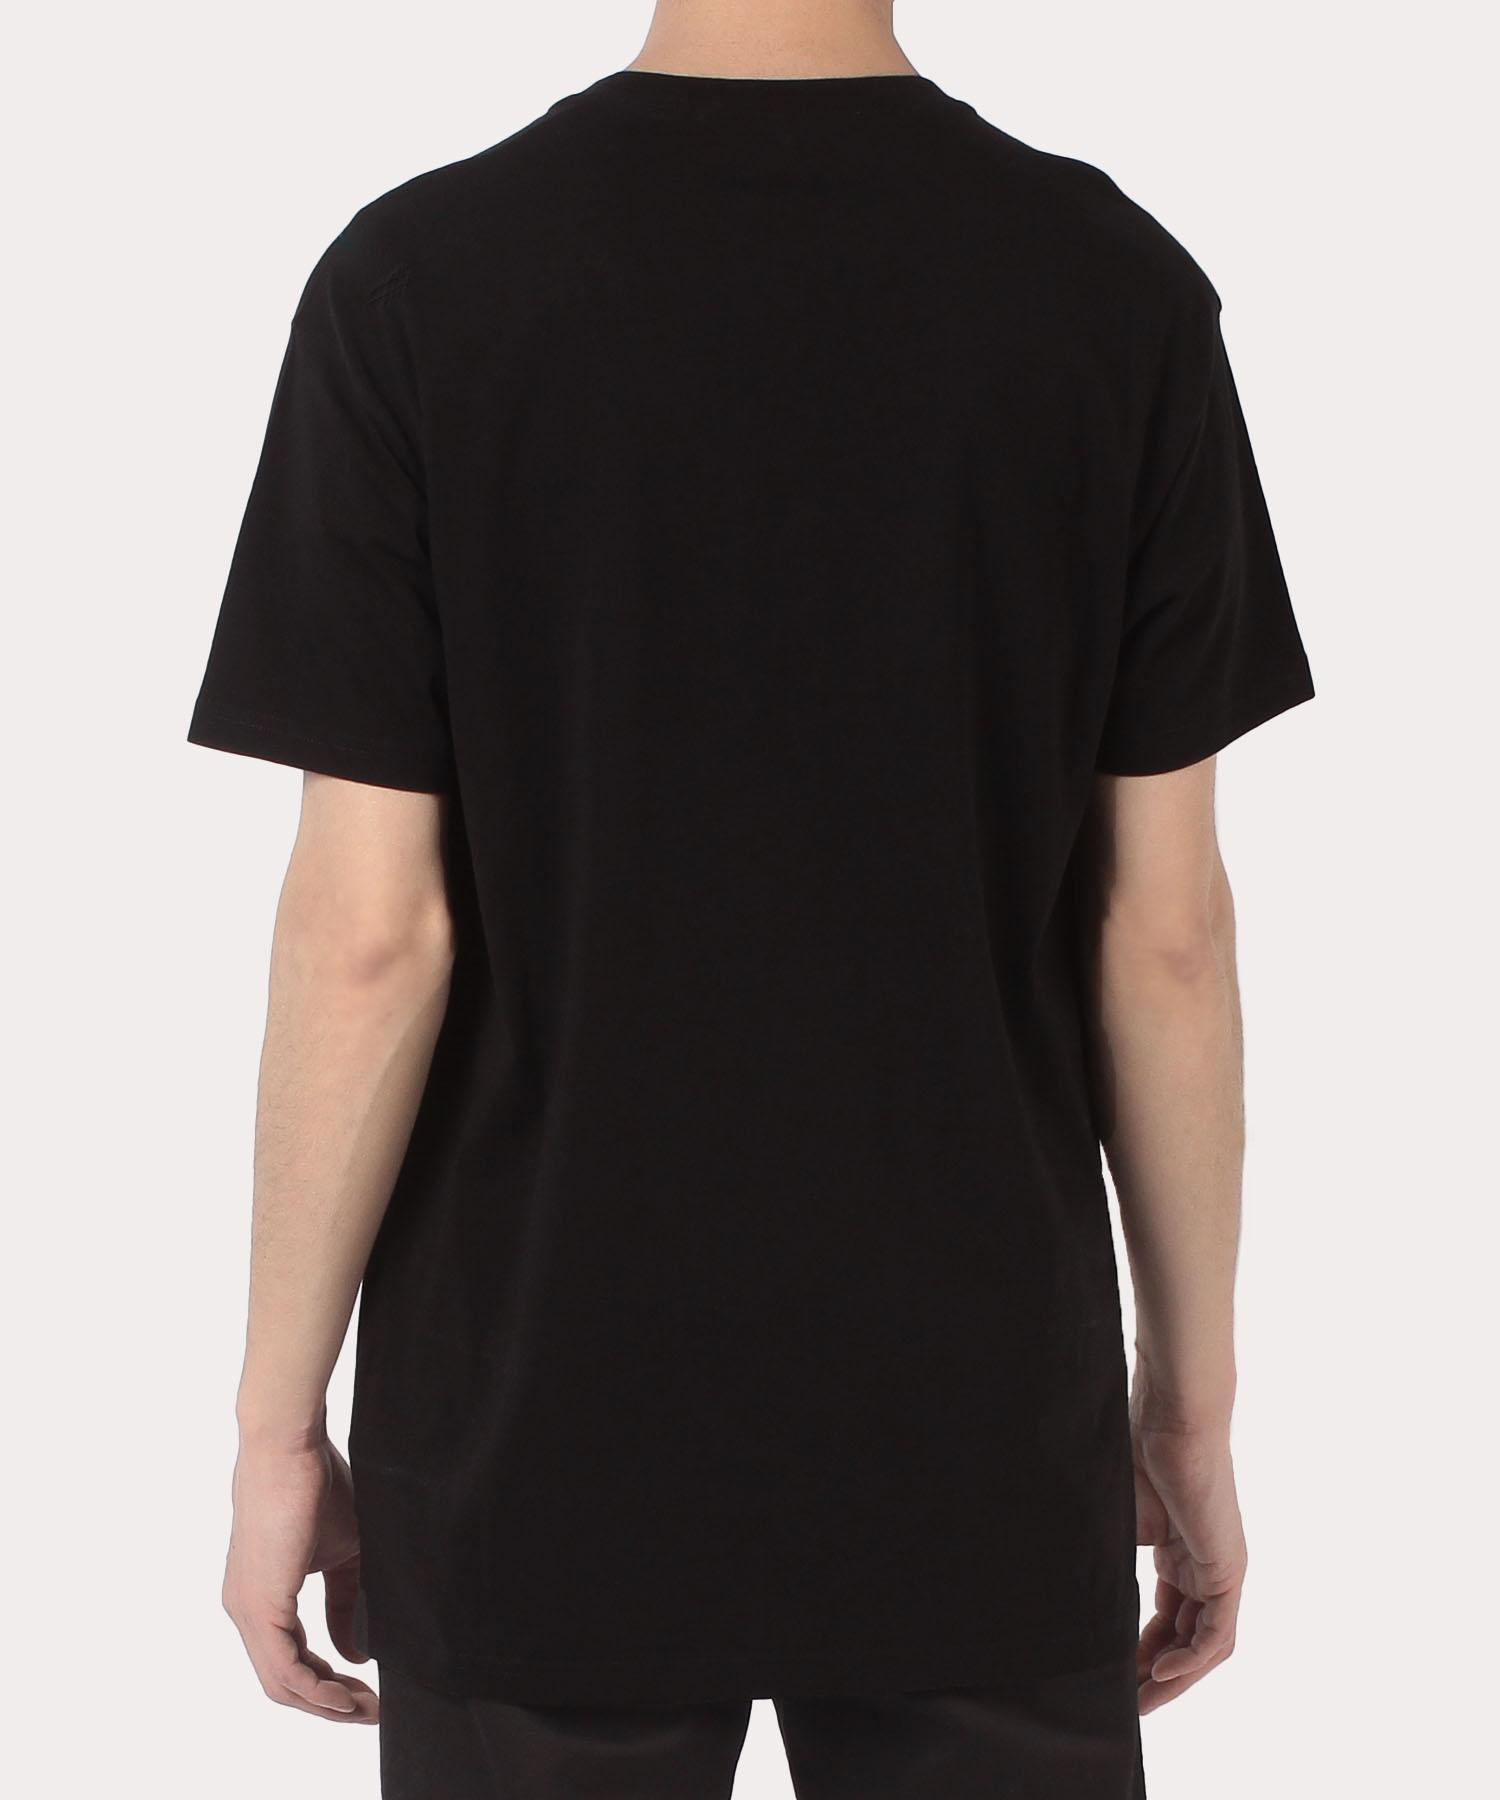 CATS 半袖Tシャツ